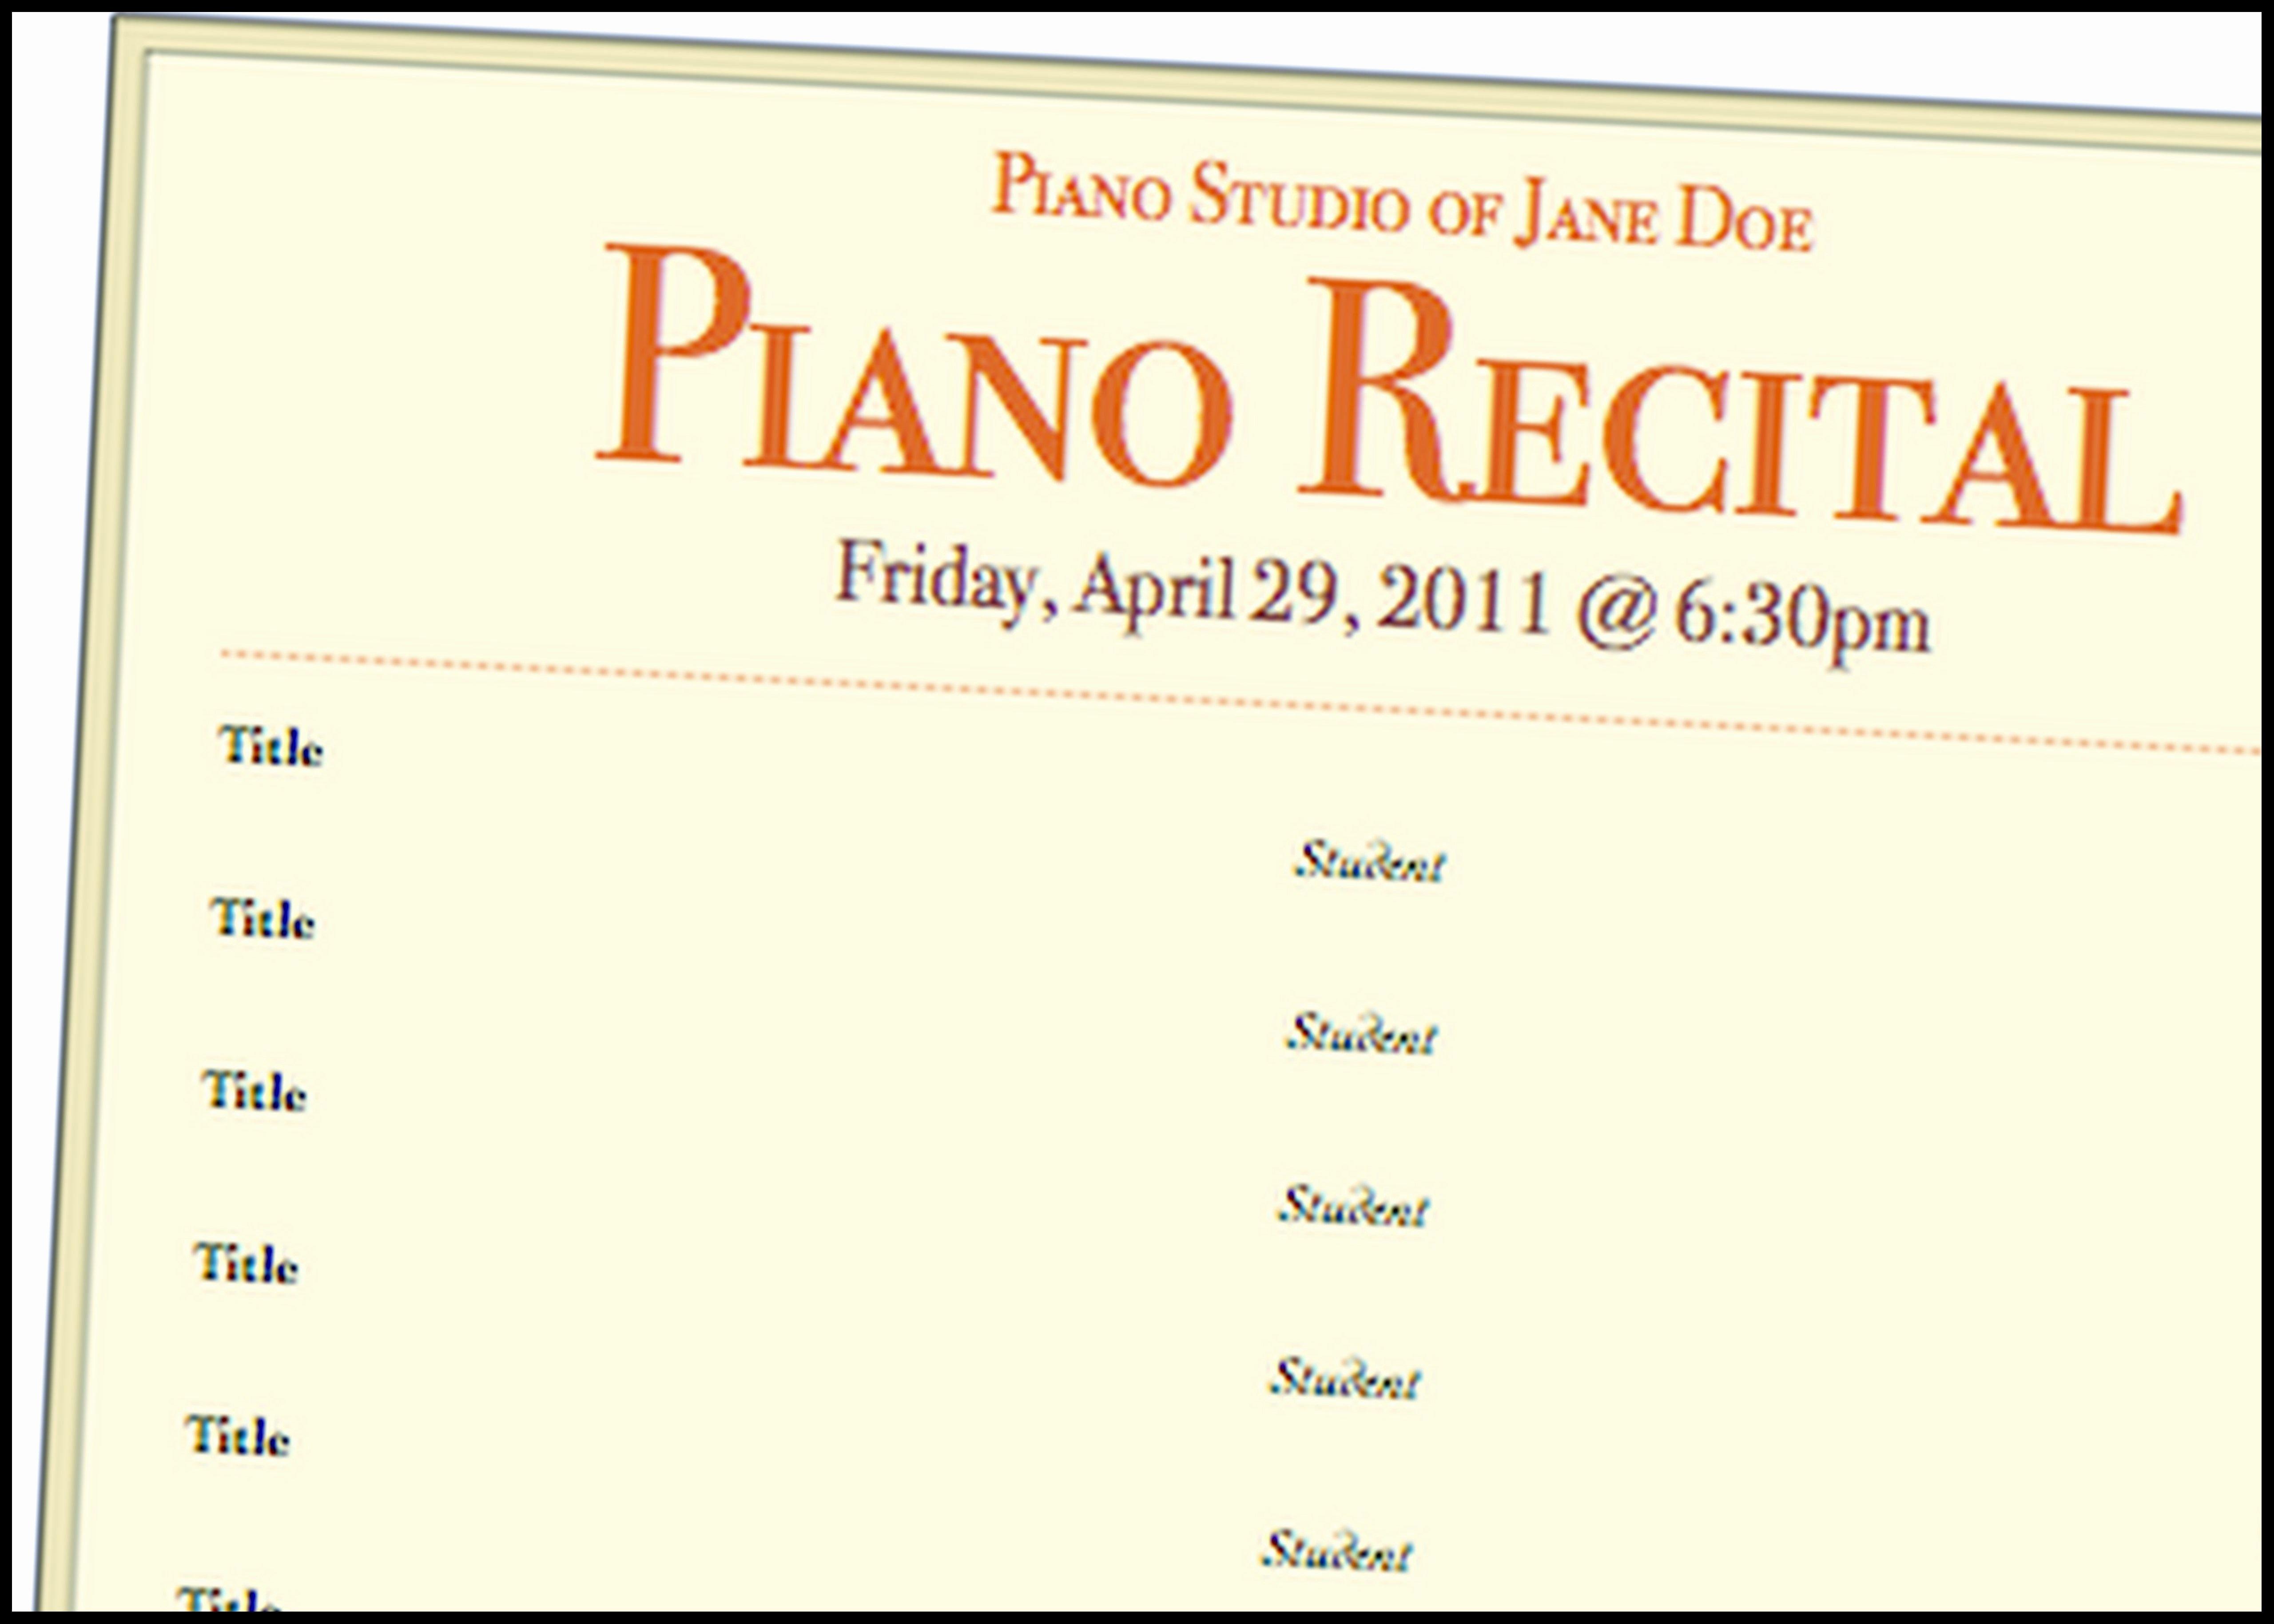 Concert Program Template Free Beautiful A Basic Piano Recital Program Template for Free Music